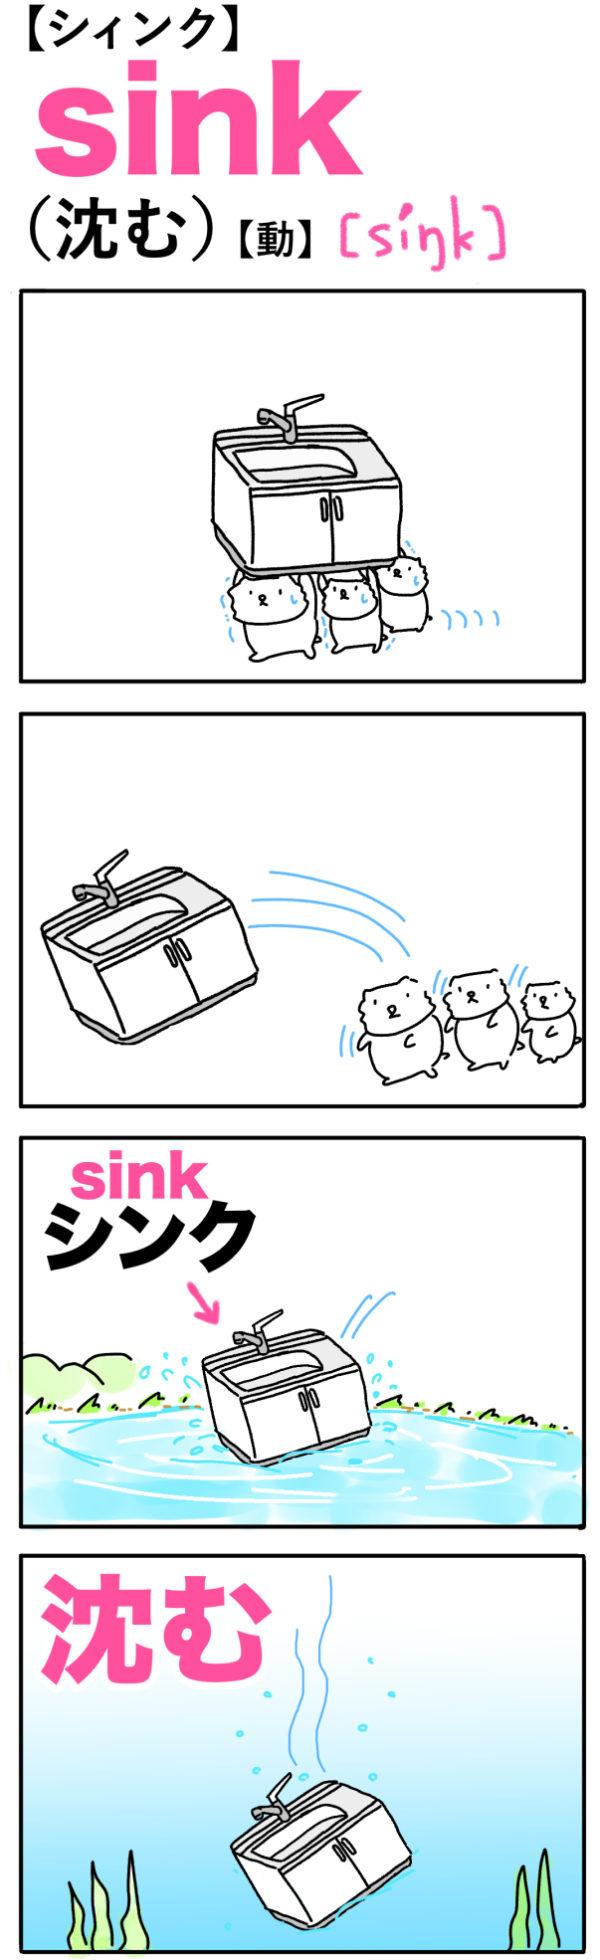 sink(沈む)の語呂合わせ英単語